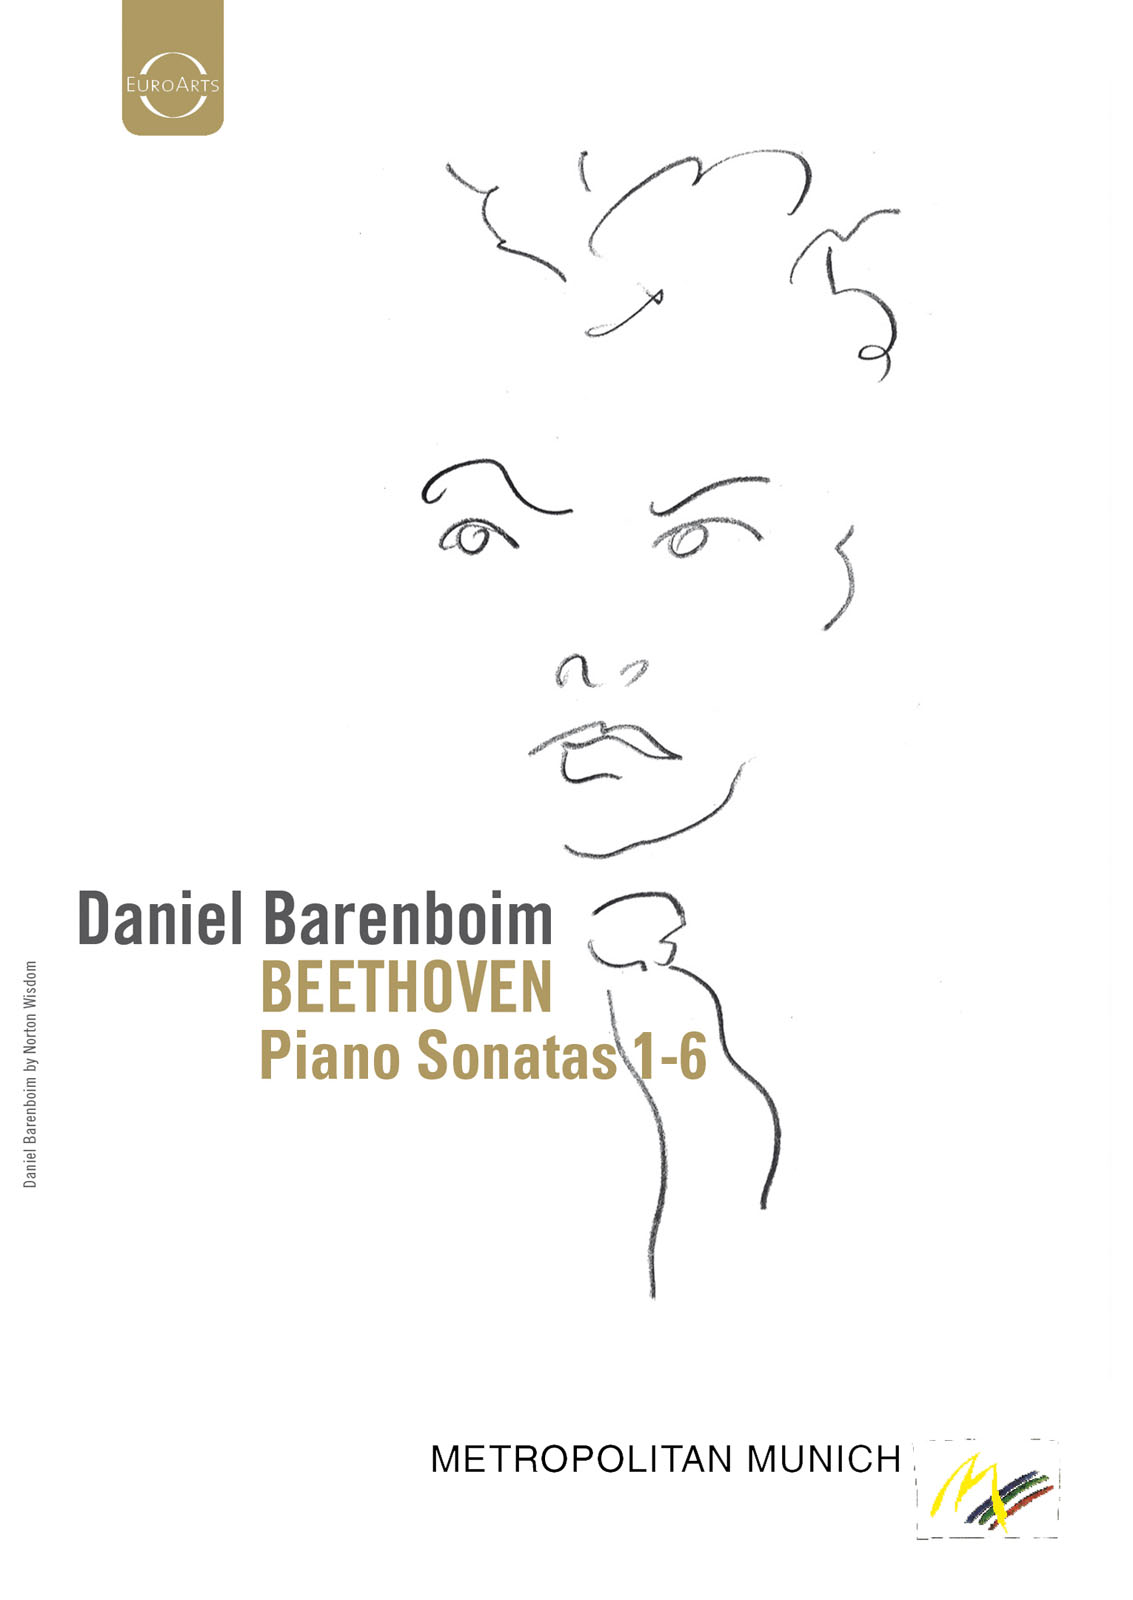 Daniel Barenboim: Beethoven - Piano Sonatas 1-6